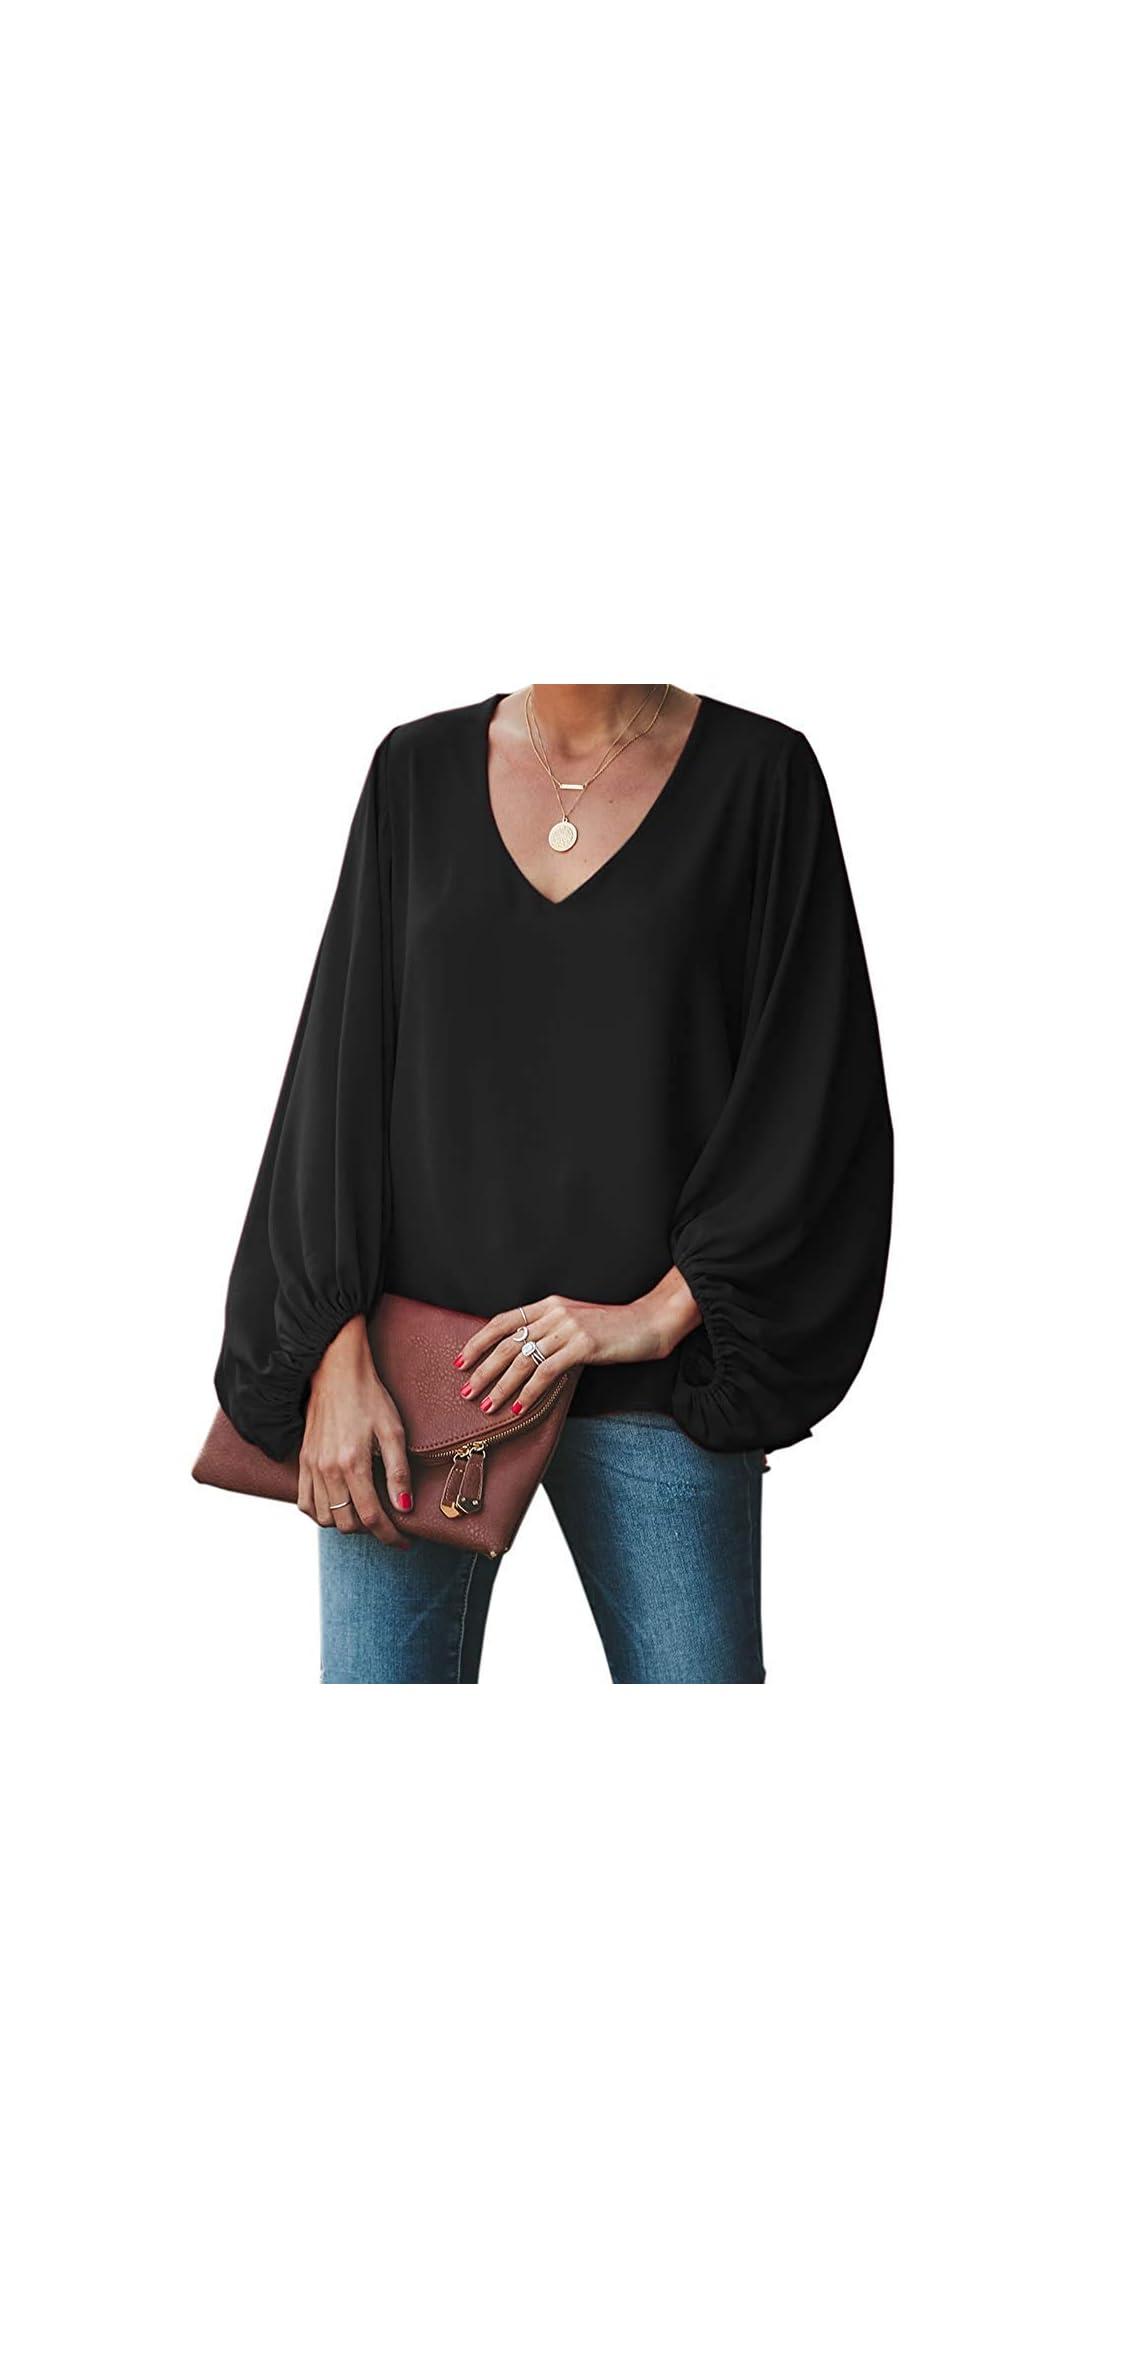 Womens Oversized Lantern Sleeve Chiffon Blouse Tops Loose